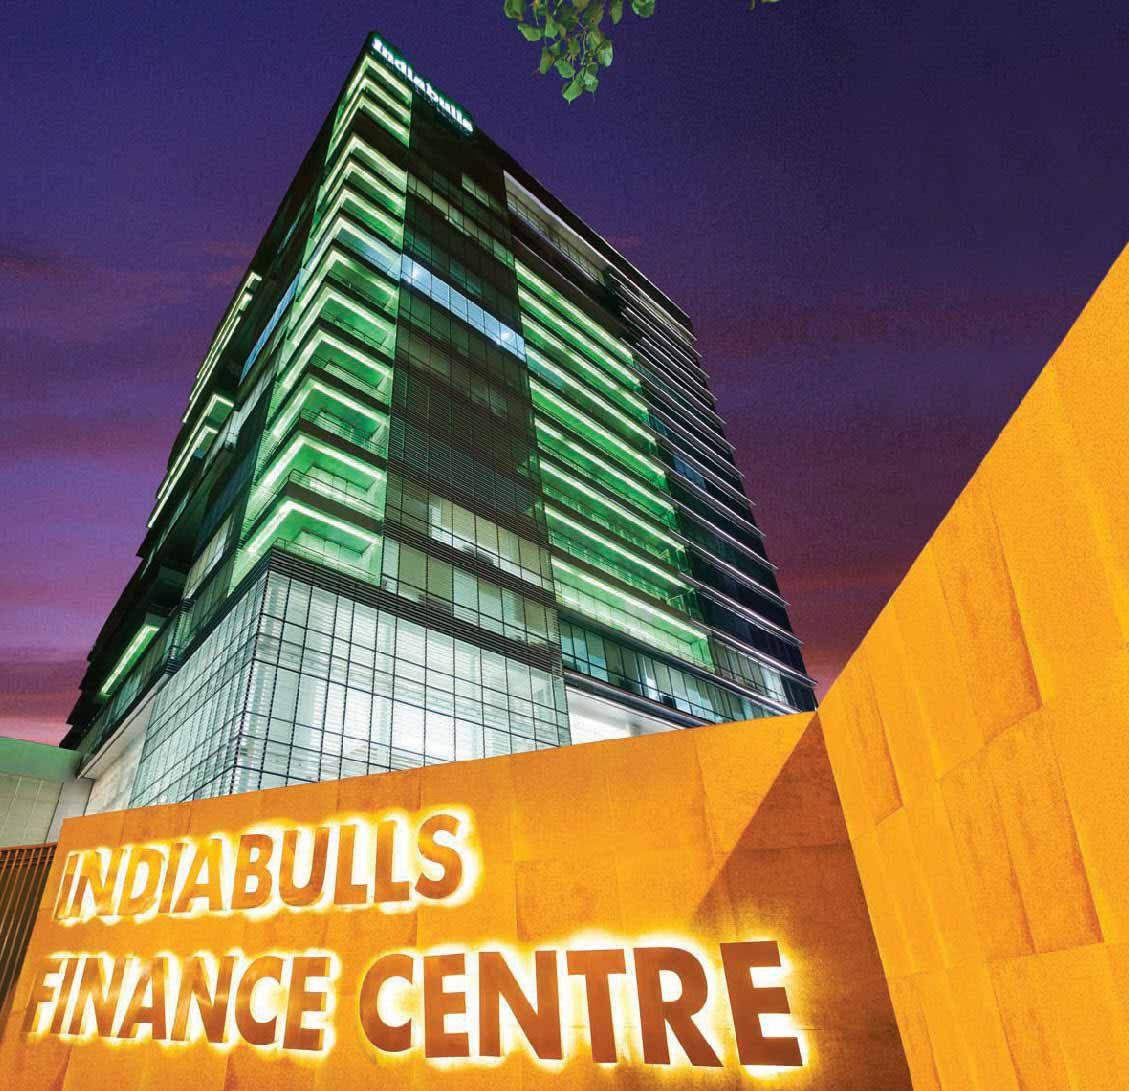 Indiabulls finance centre